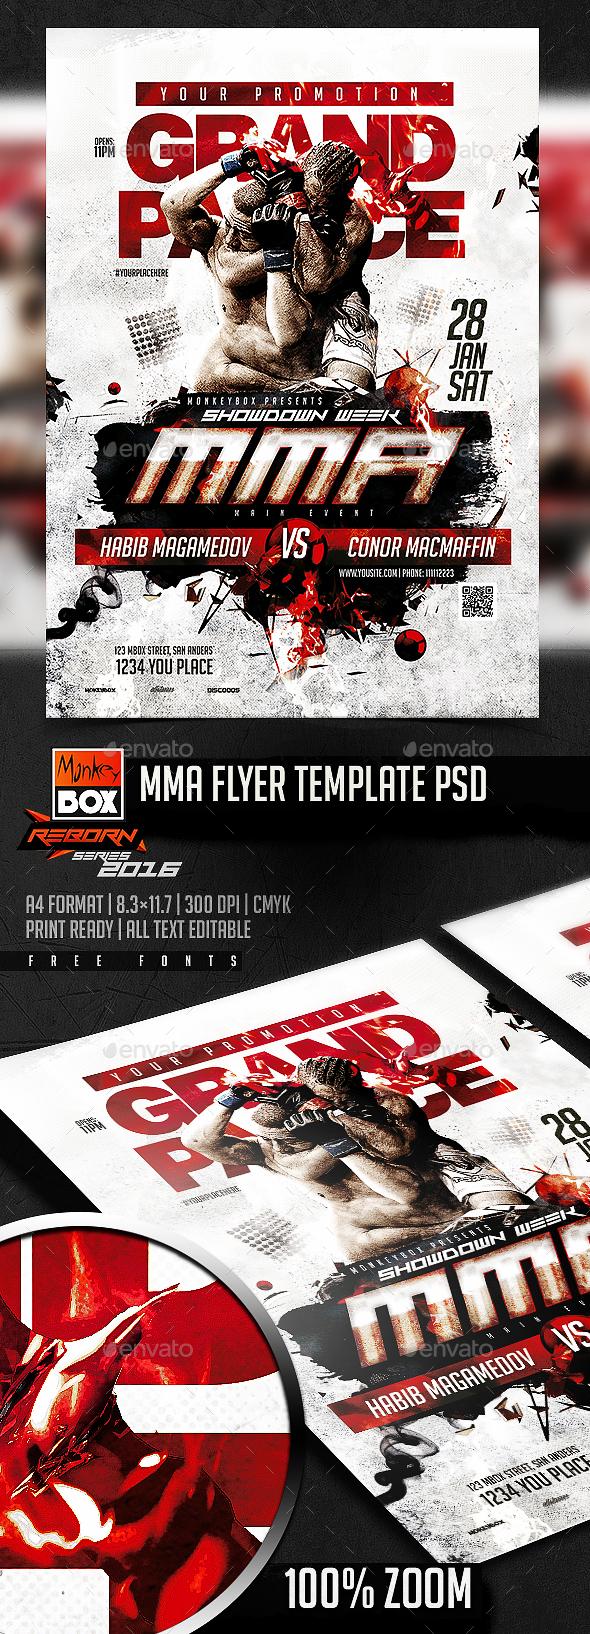 MMA Flyer Template PSD - Flyers Print Templates